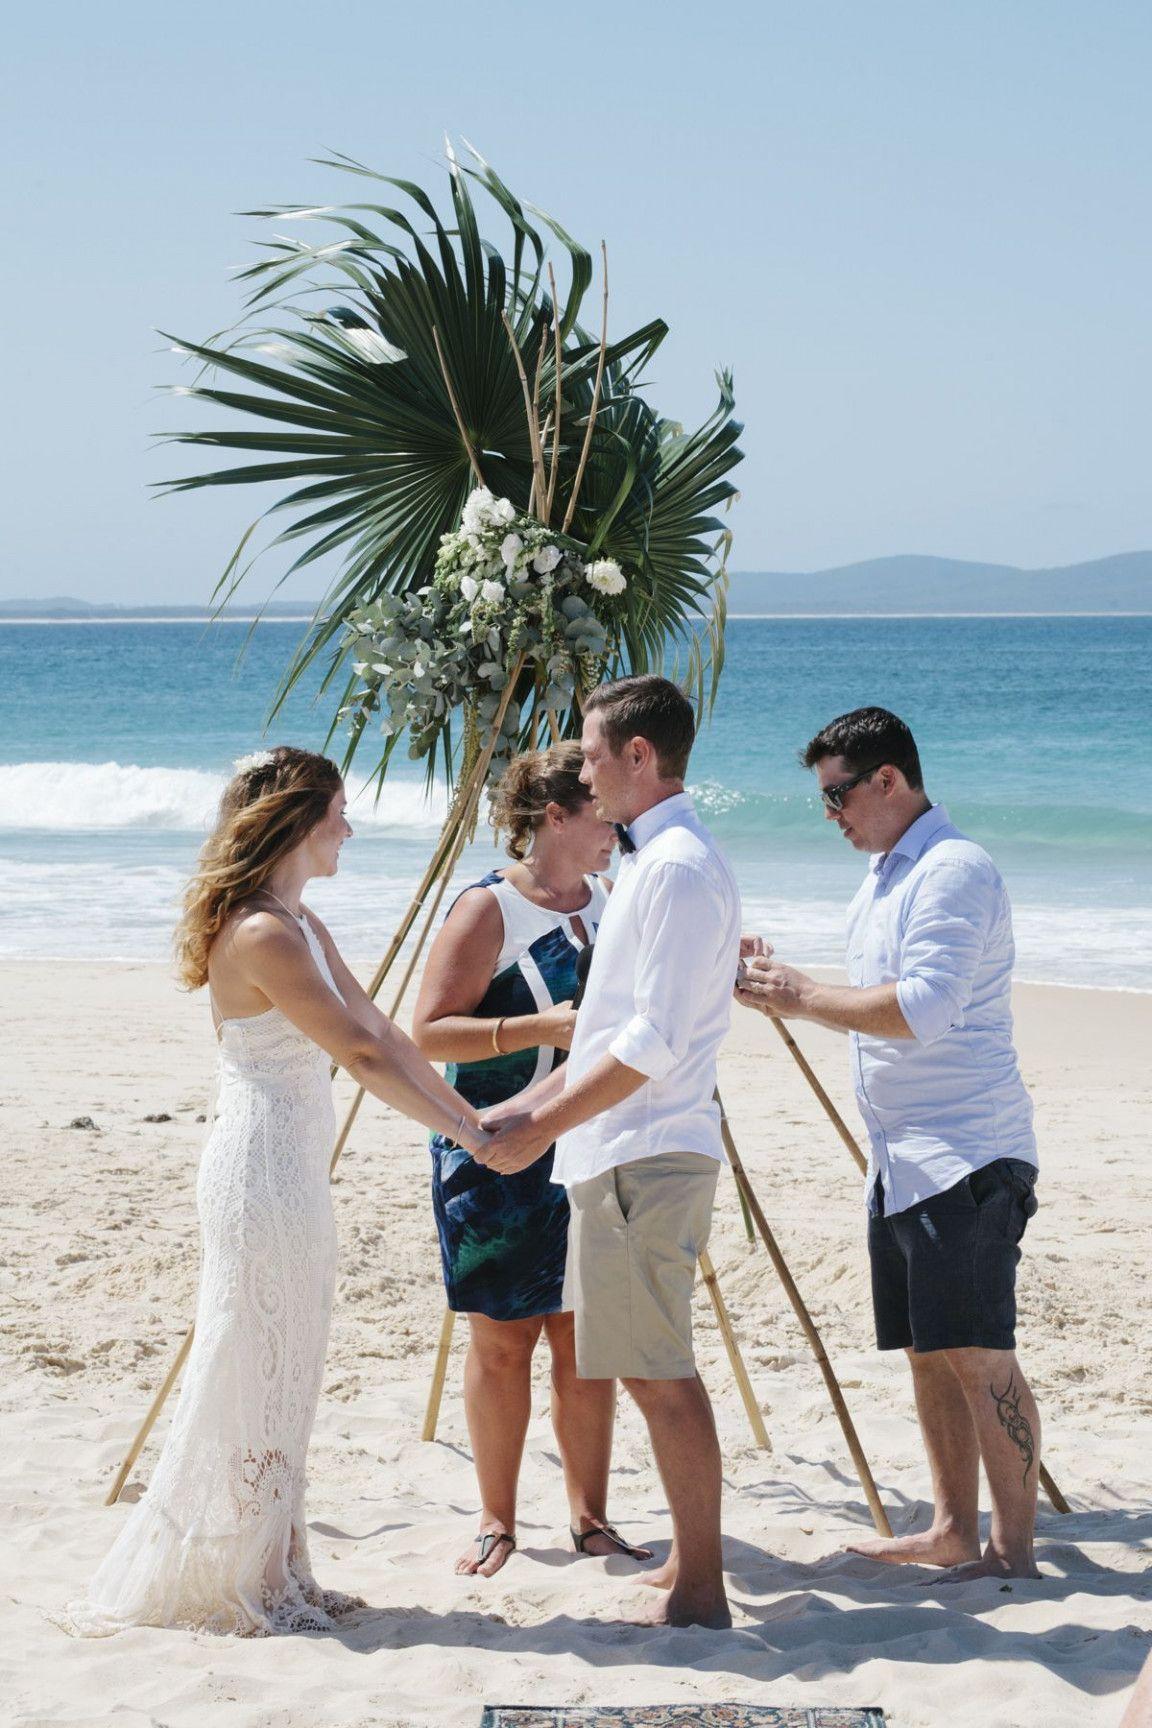 Seven Benefits Of Beach Weddings Australia That May Change